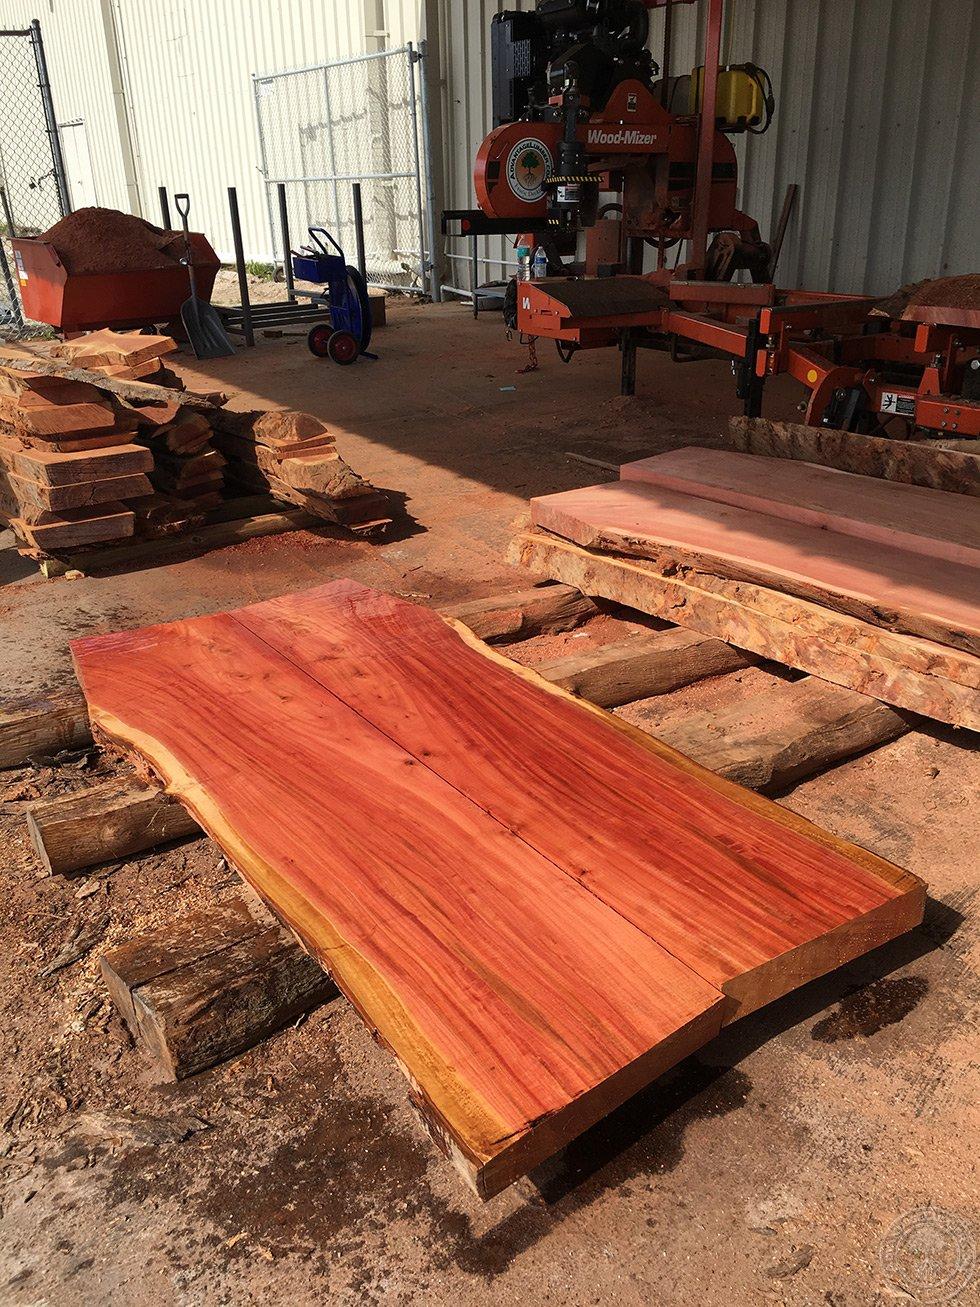 Eucalyptus slabs being milled  eucalyptus slabs florida lumber mill. Eucalyptus Lumber   Shipped directly to you